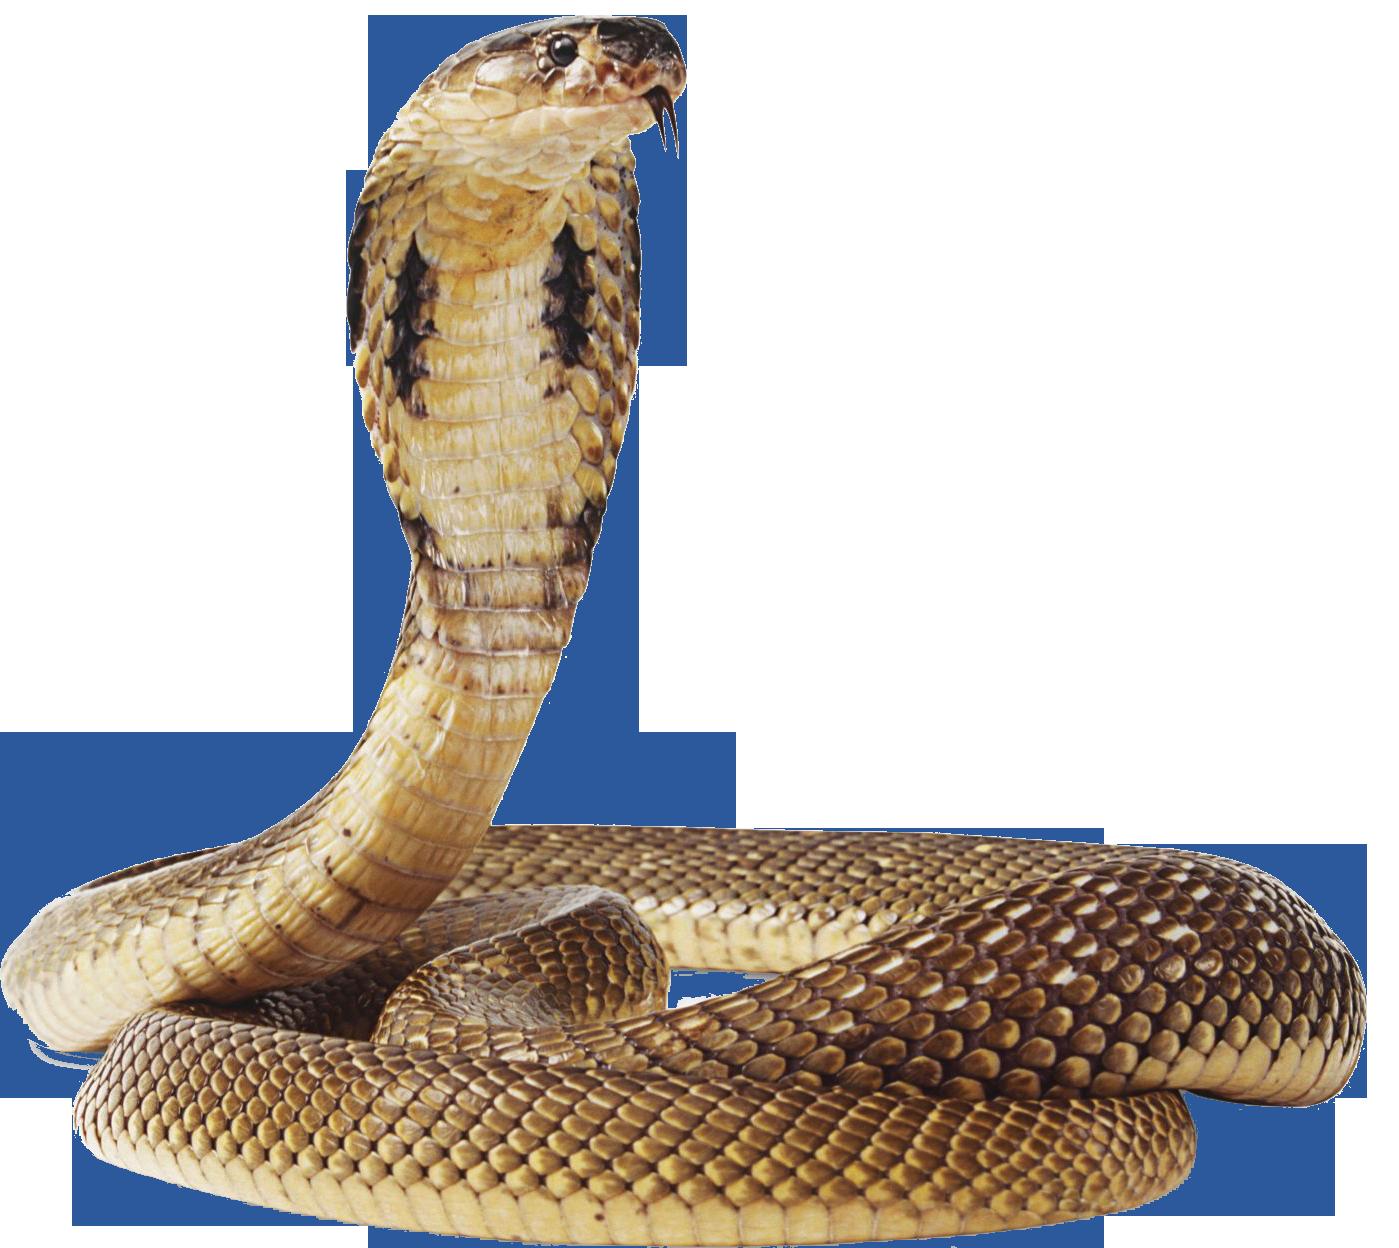 Anaconda PNG Transparent Images.